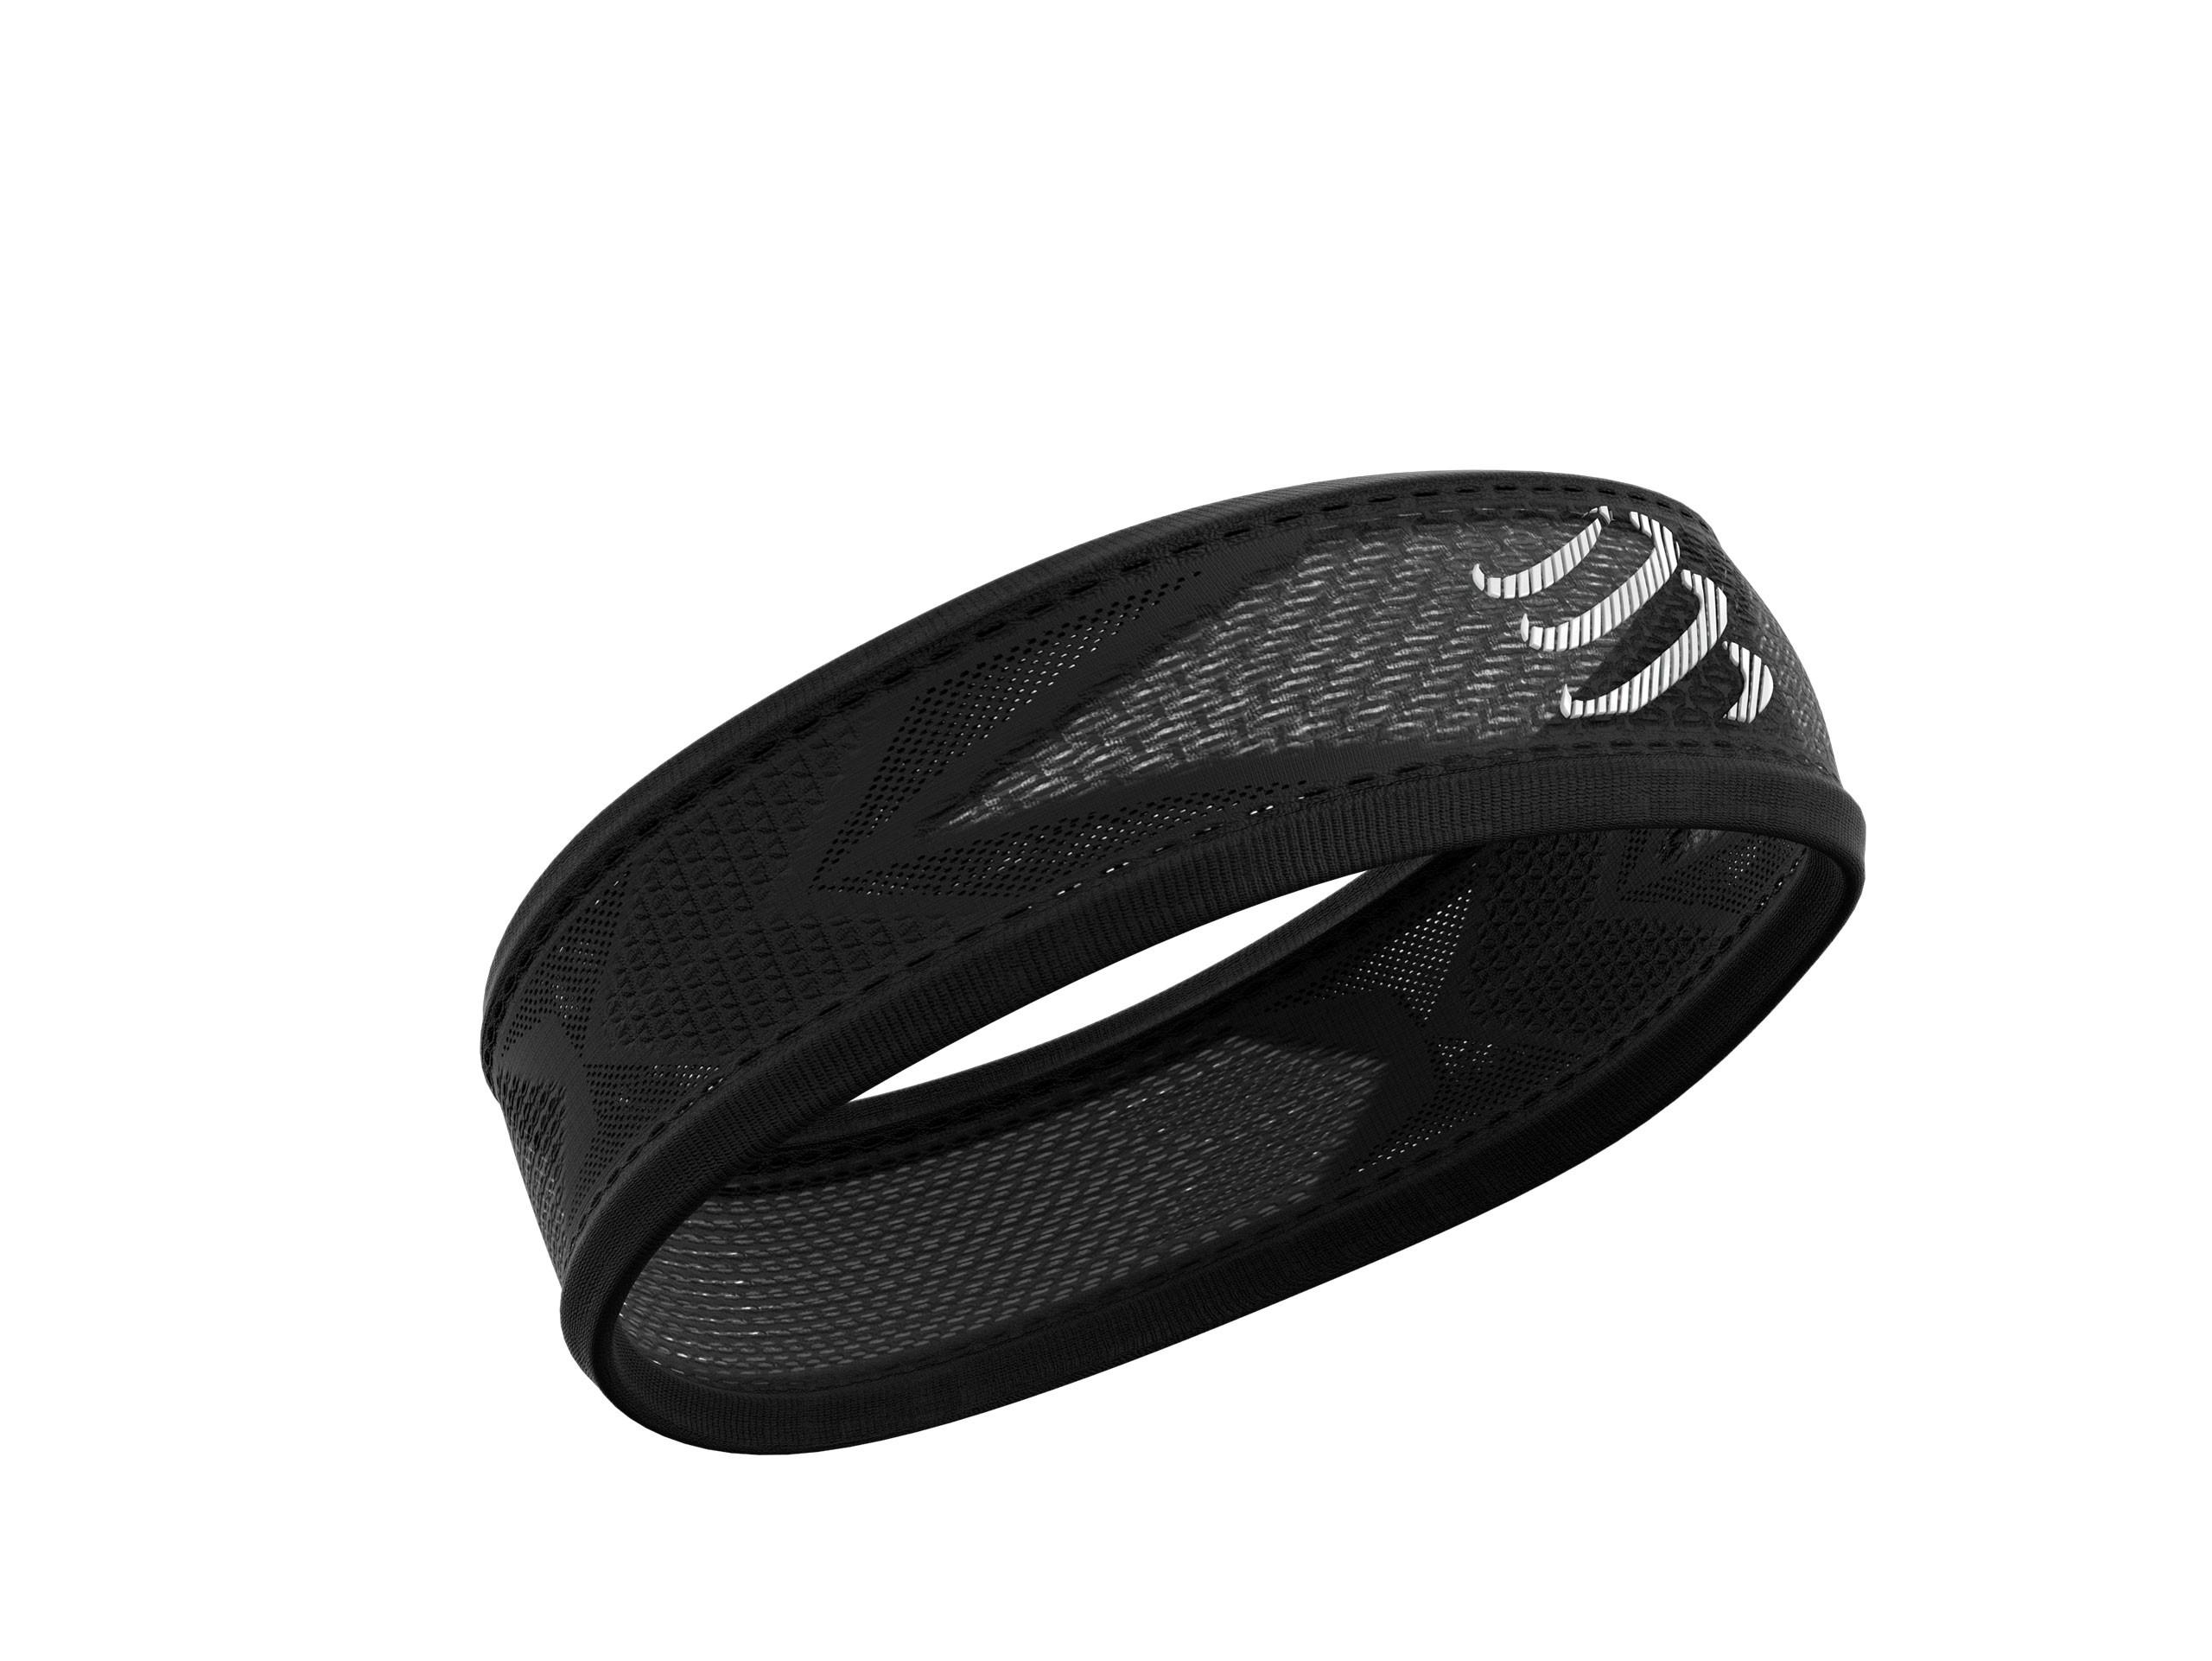 Thin HeadBand On/Off black